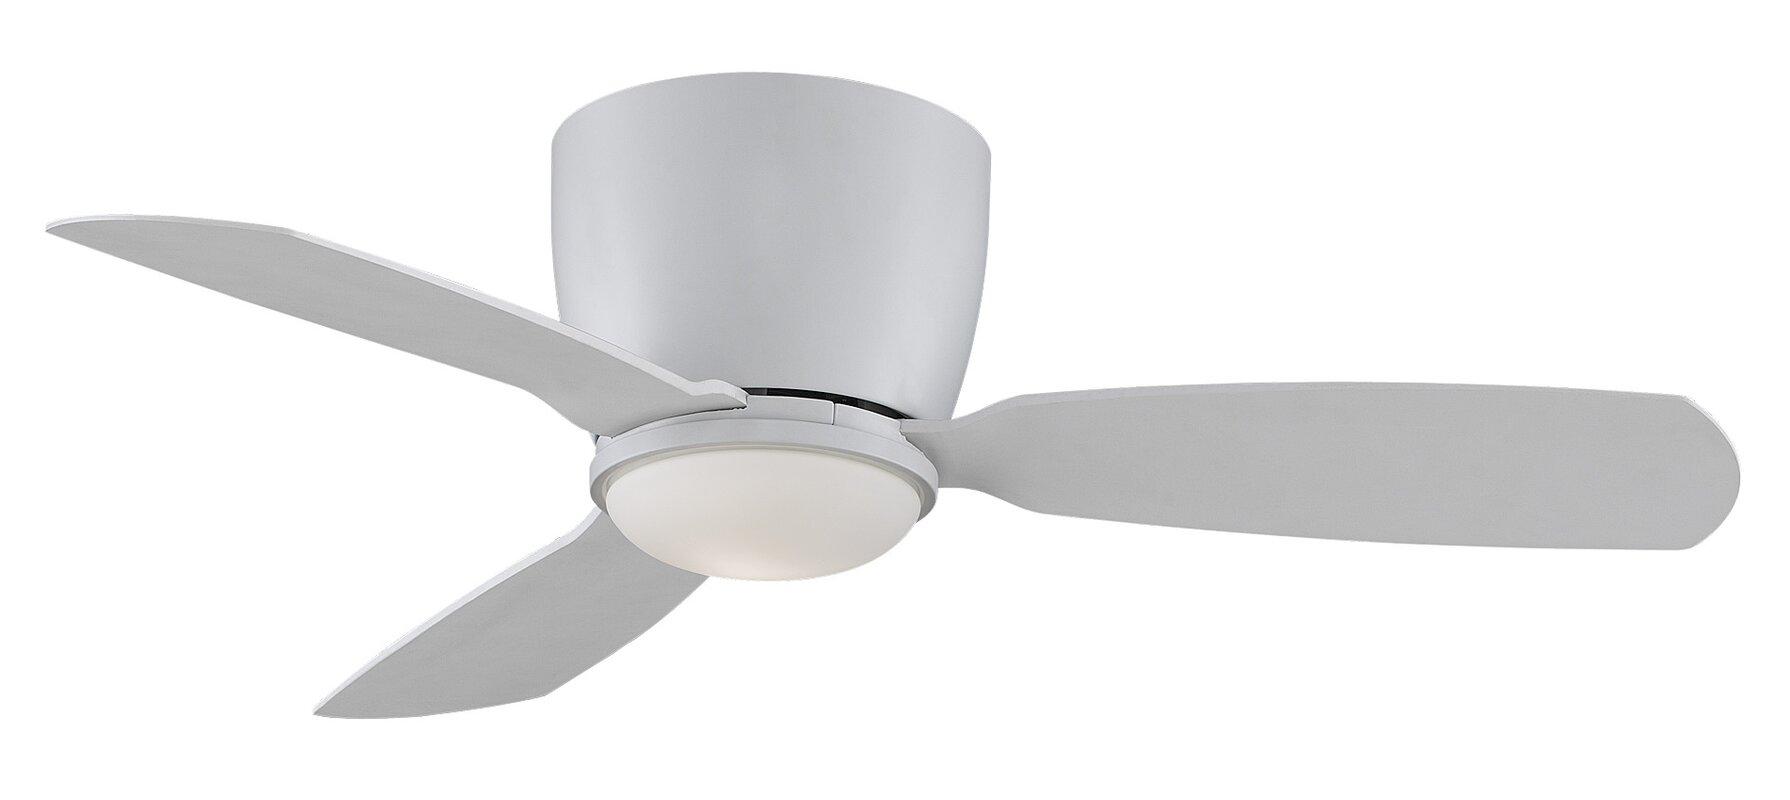 modern ceiling fan white. 44\ modern ceiling fan white